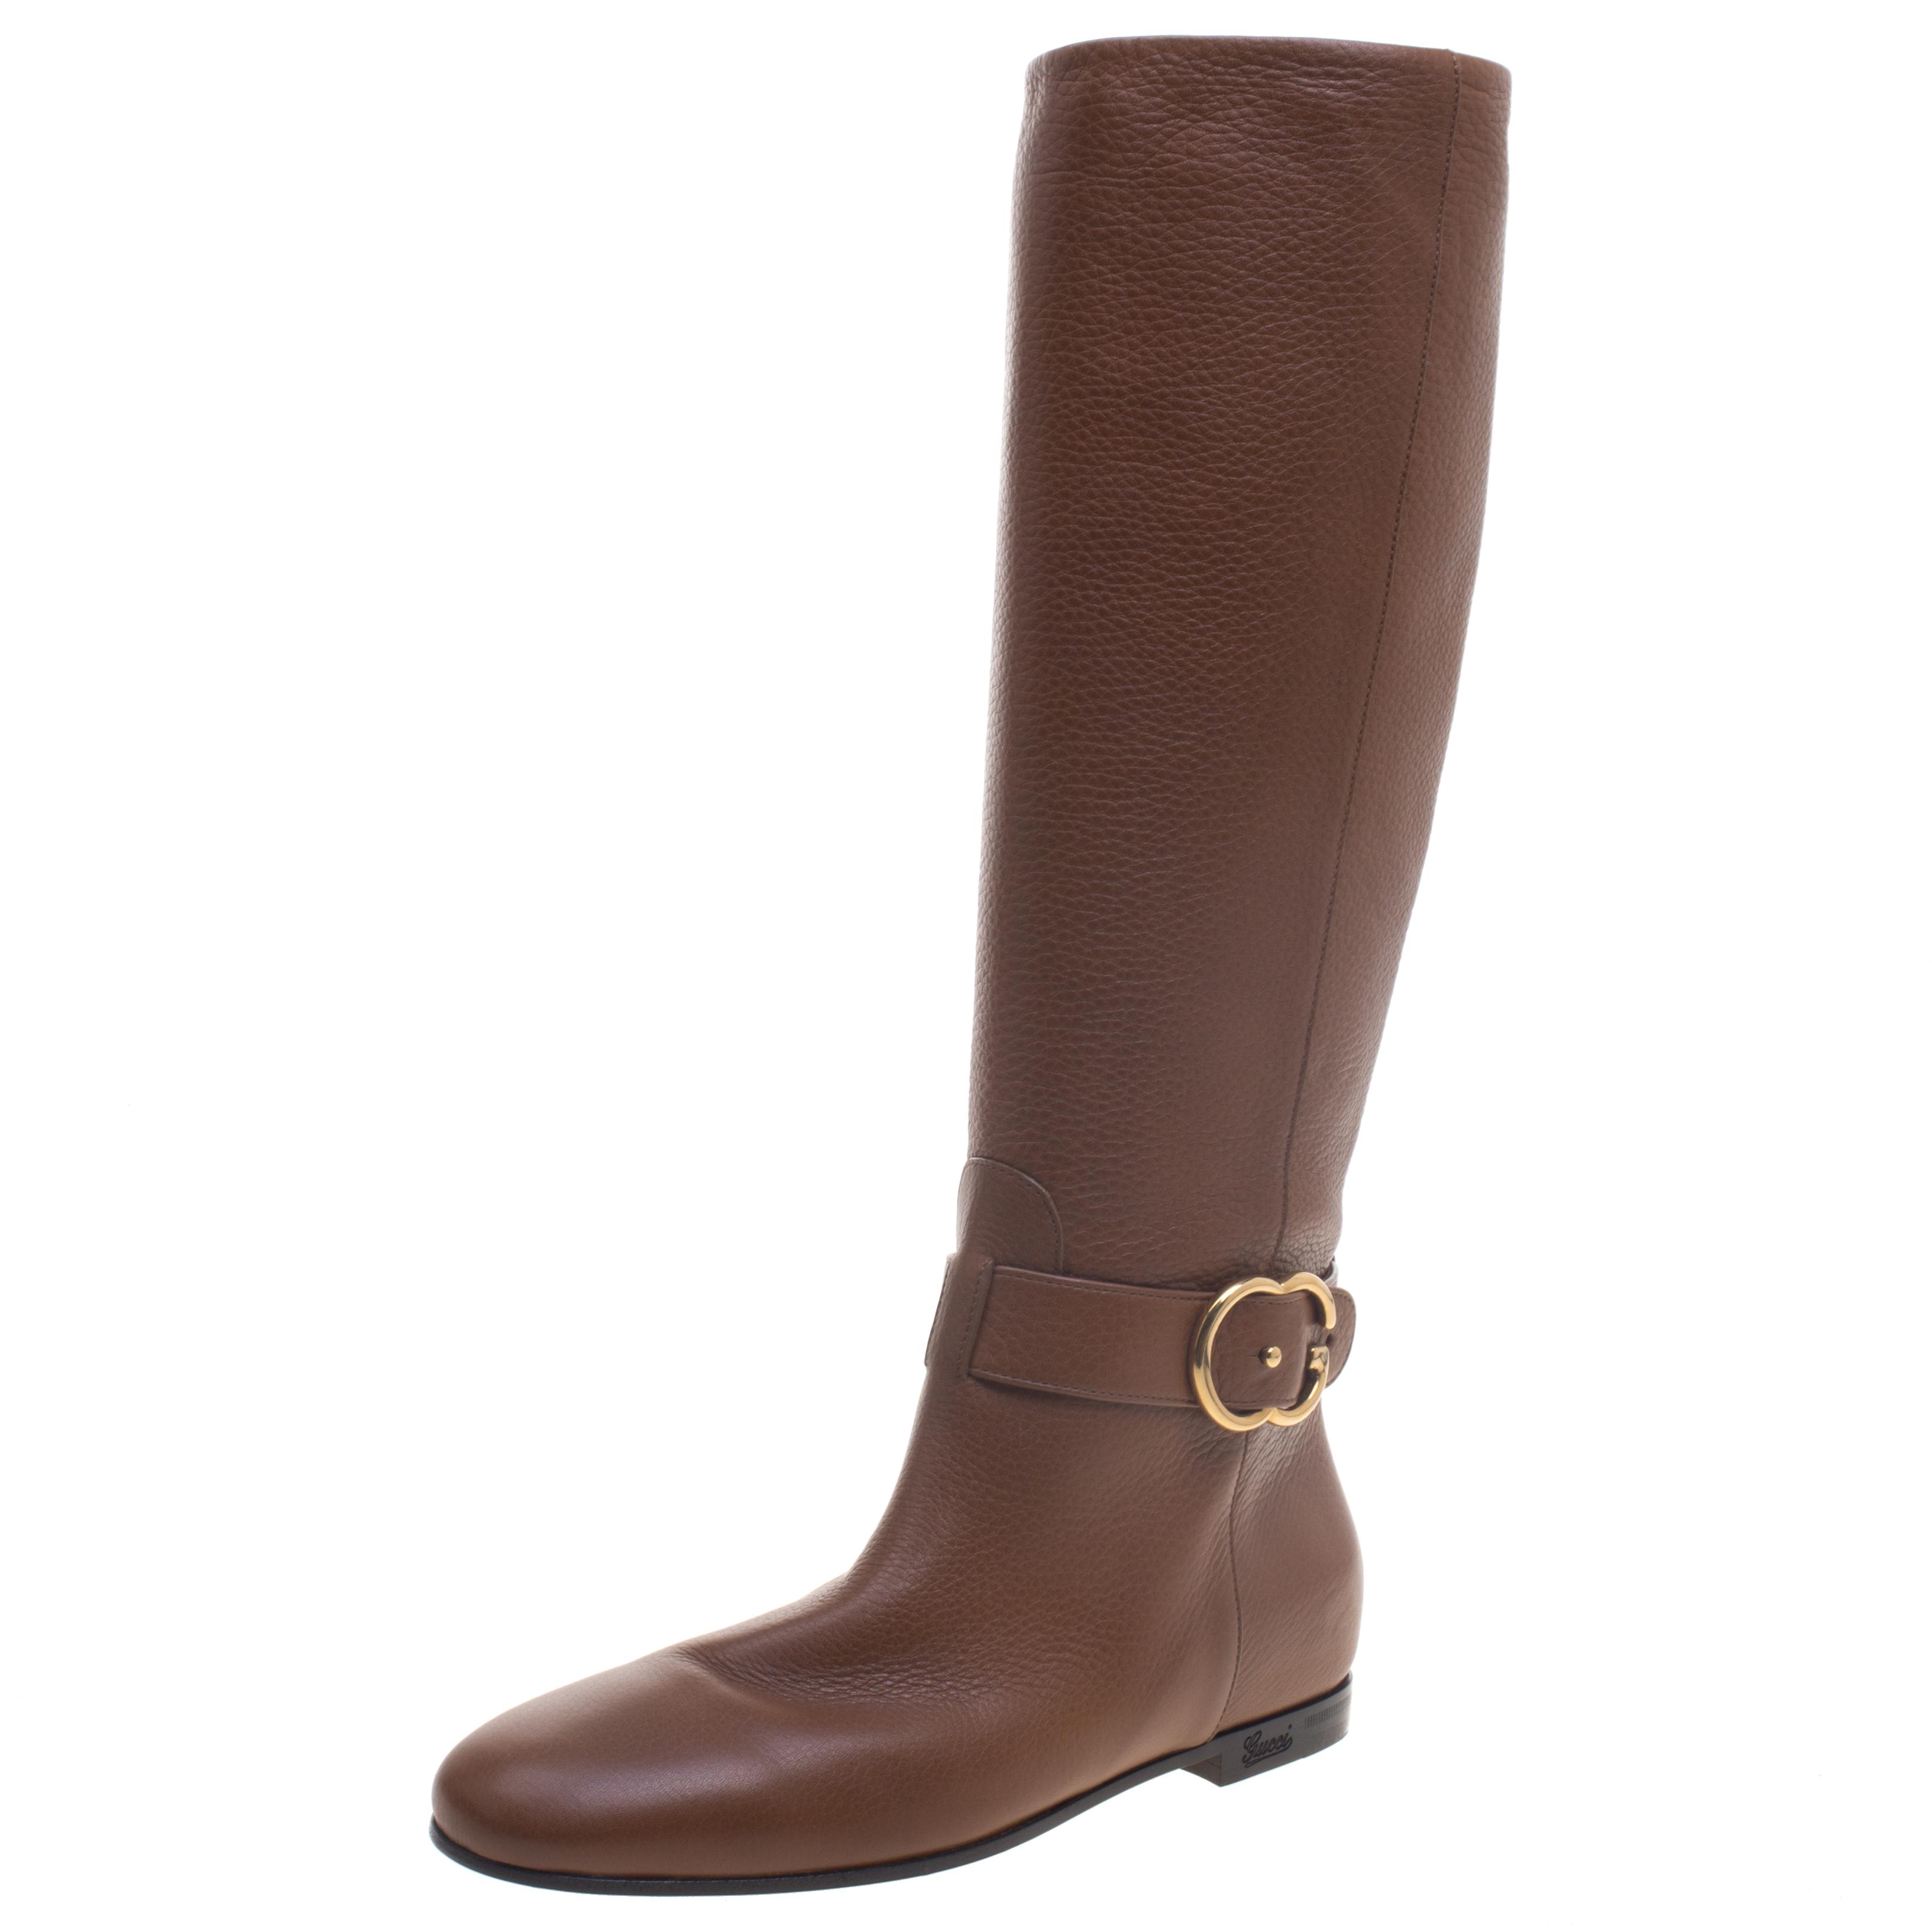 3c65c6e10 ... Gucci Brown Leather Riding Knee Boots Size 38. nextprev. prevnext